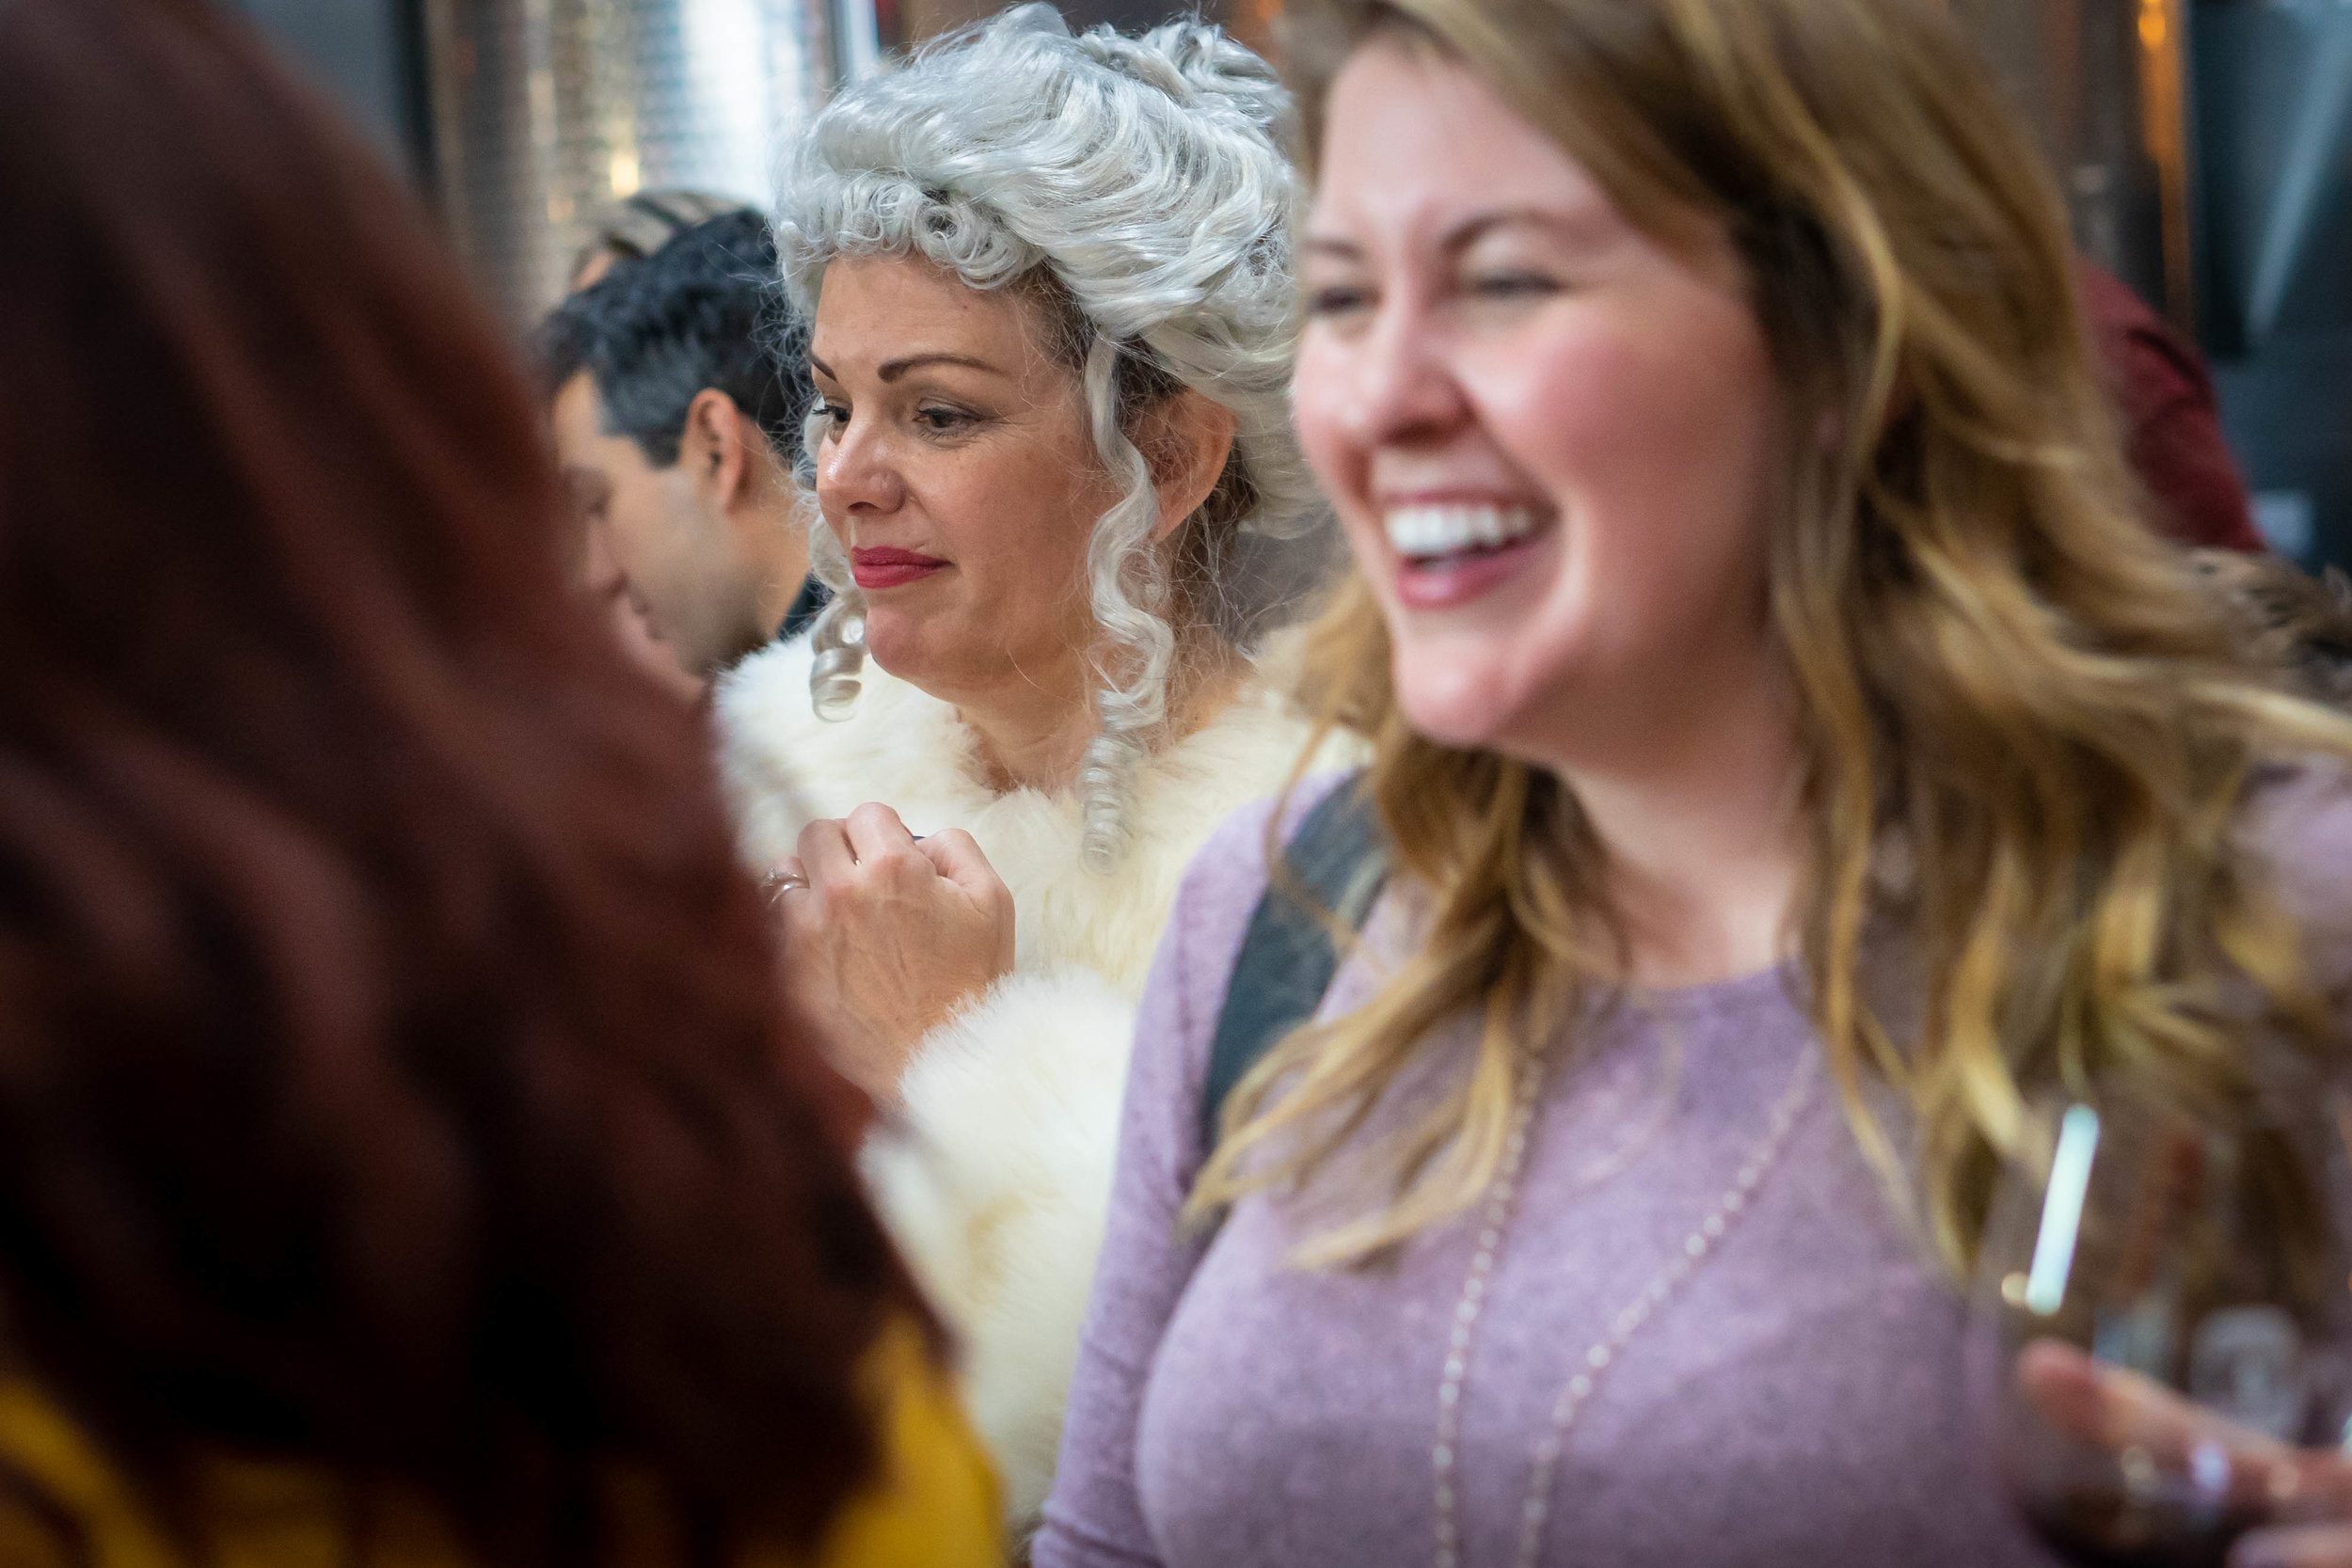 Austin Wedding Videographer - Dolls for Dolls (153 of 190).jpg